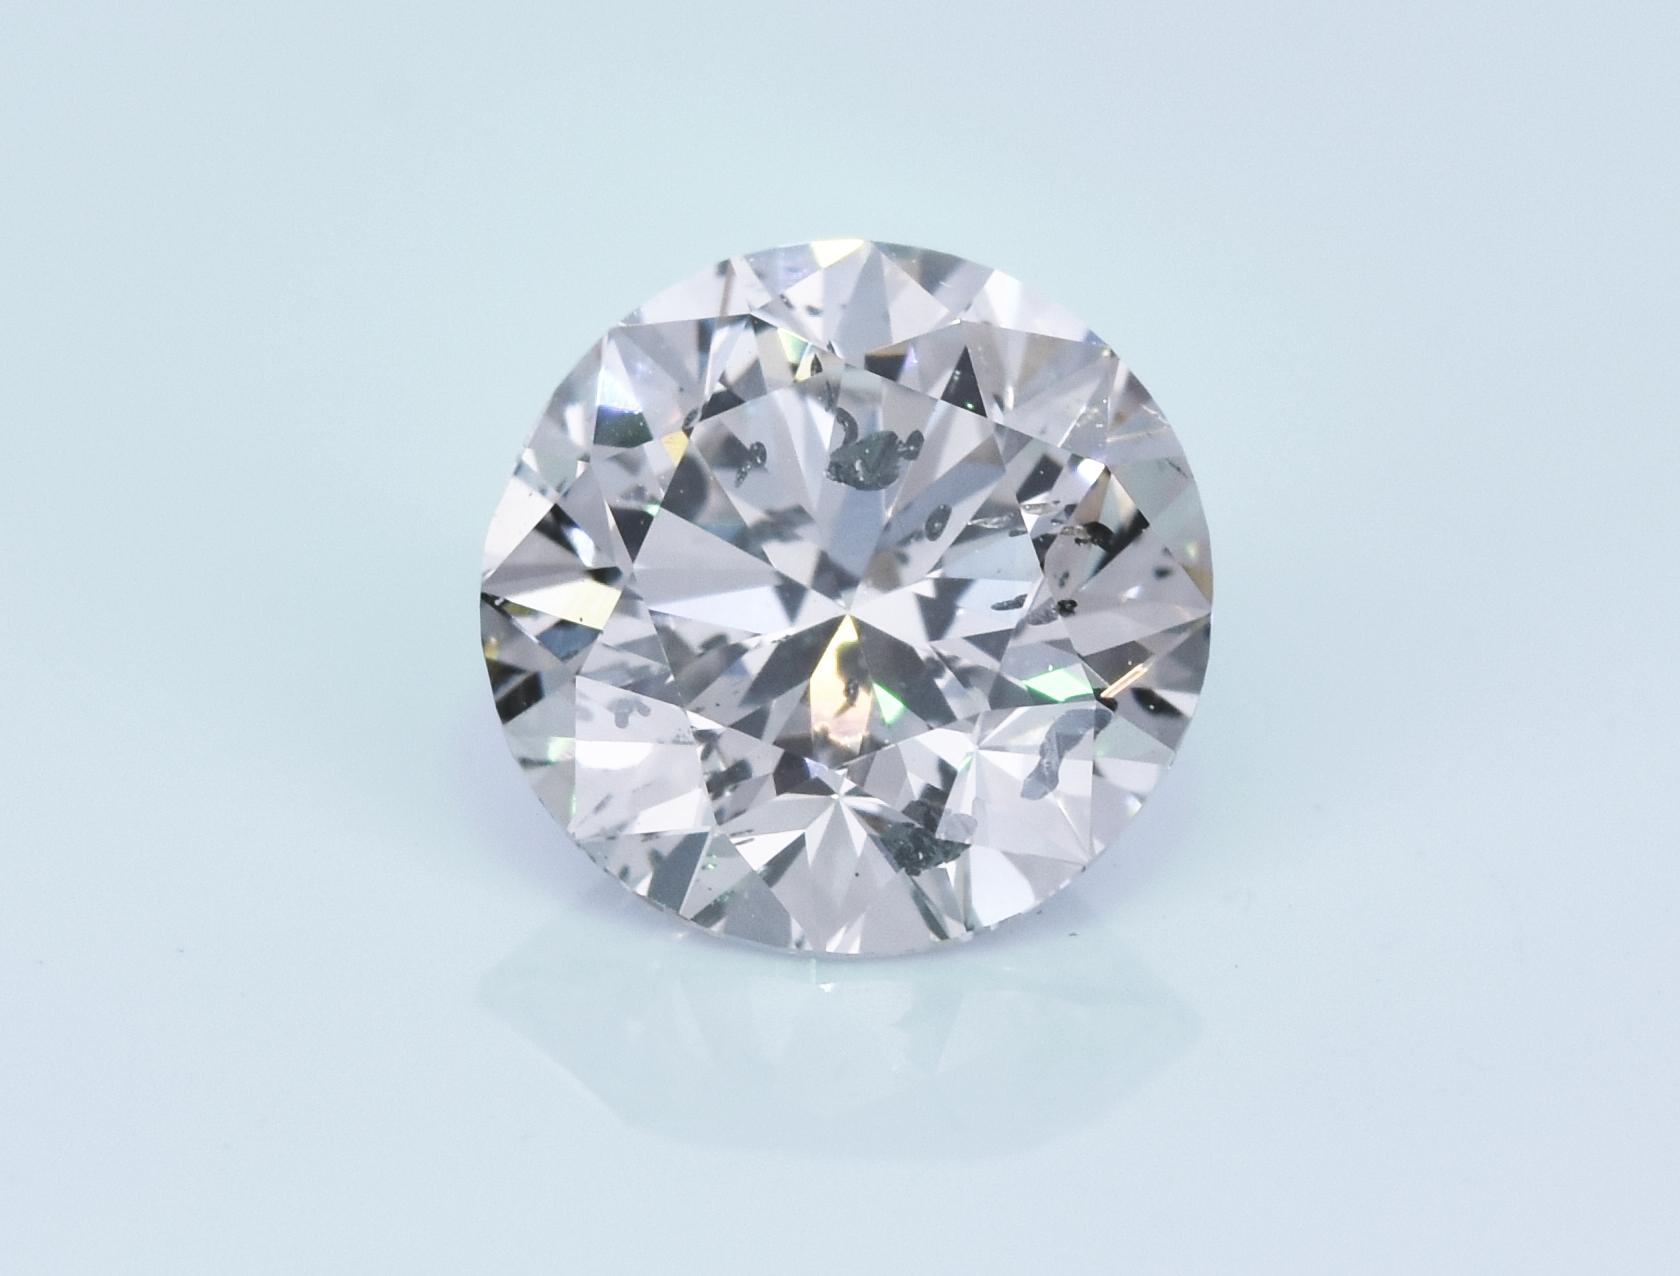 1.52 carat loose round diamond. I1, L